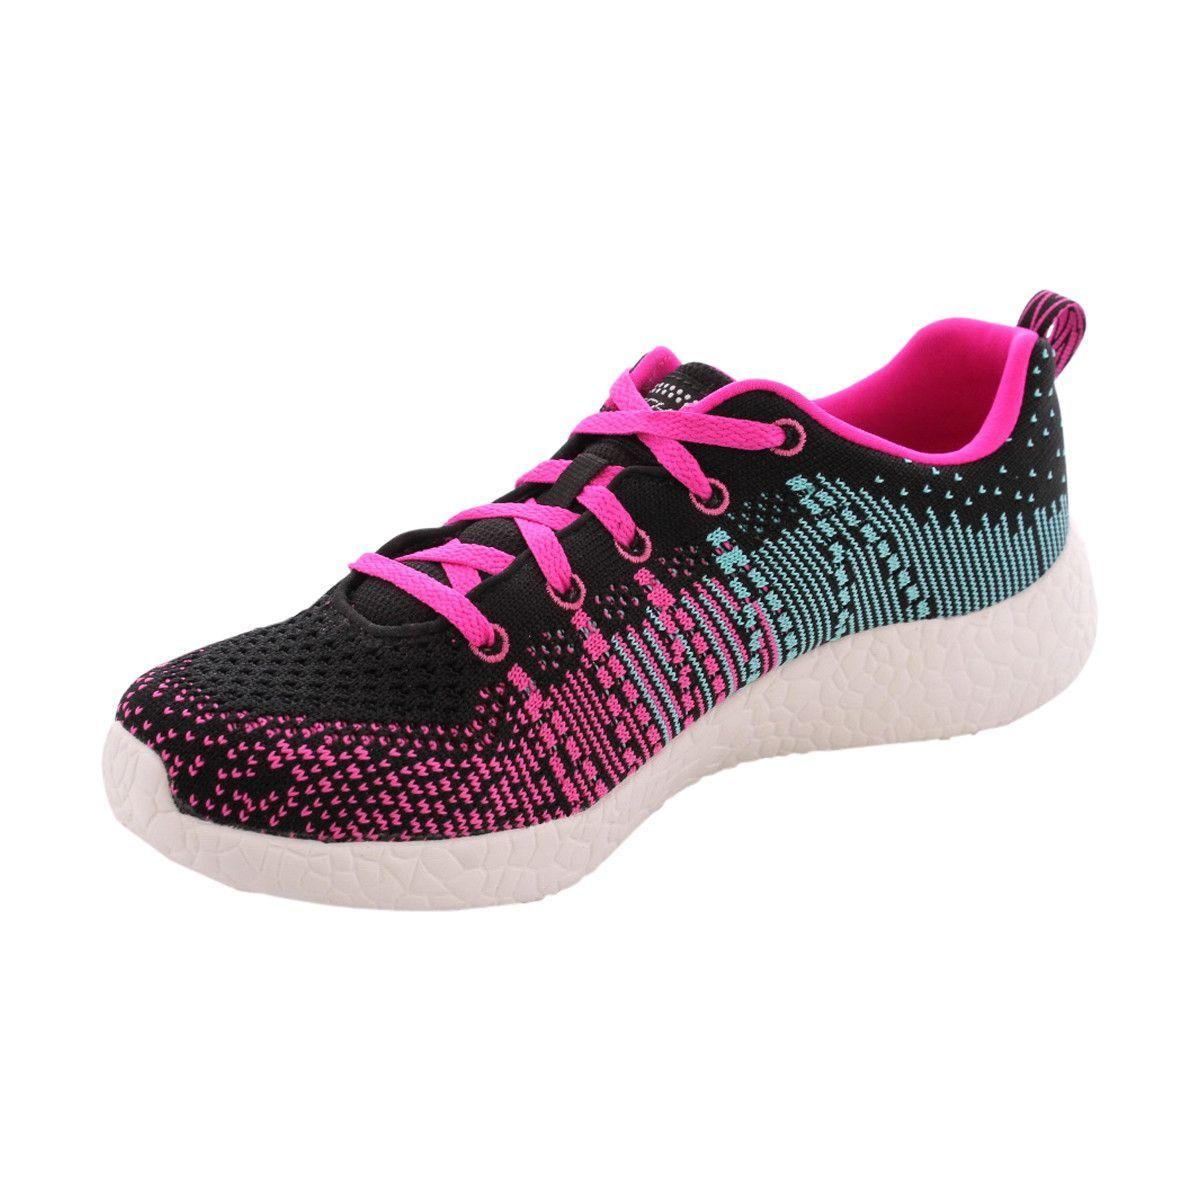 Skechers - Girl's Burst Ellipse Sneakers - Black/Pink